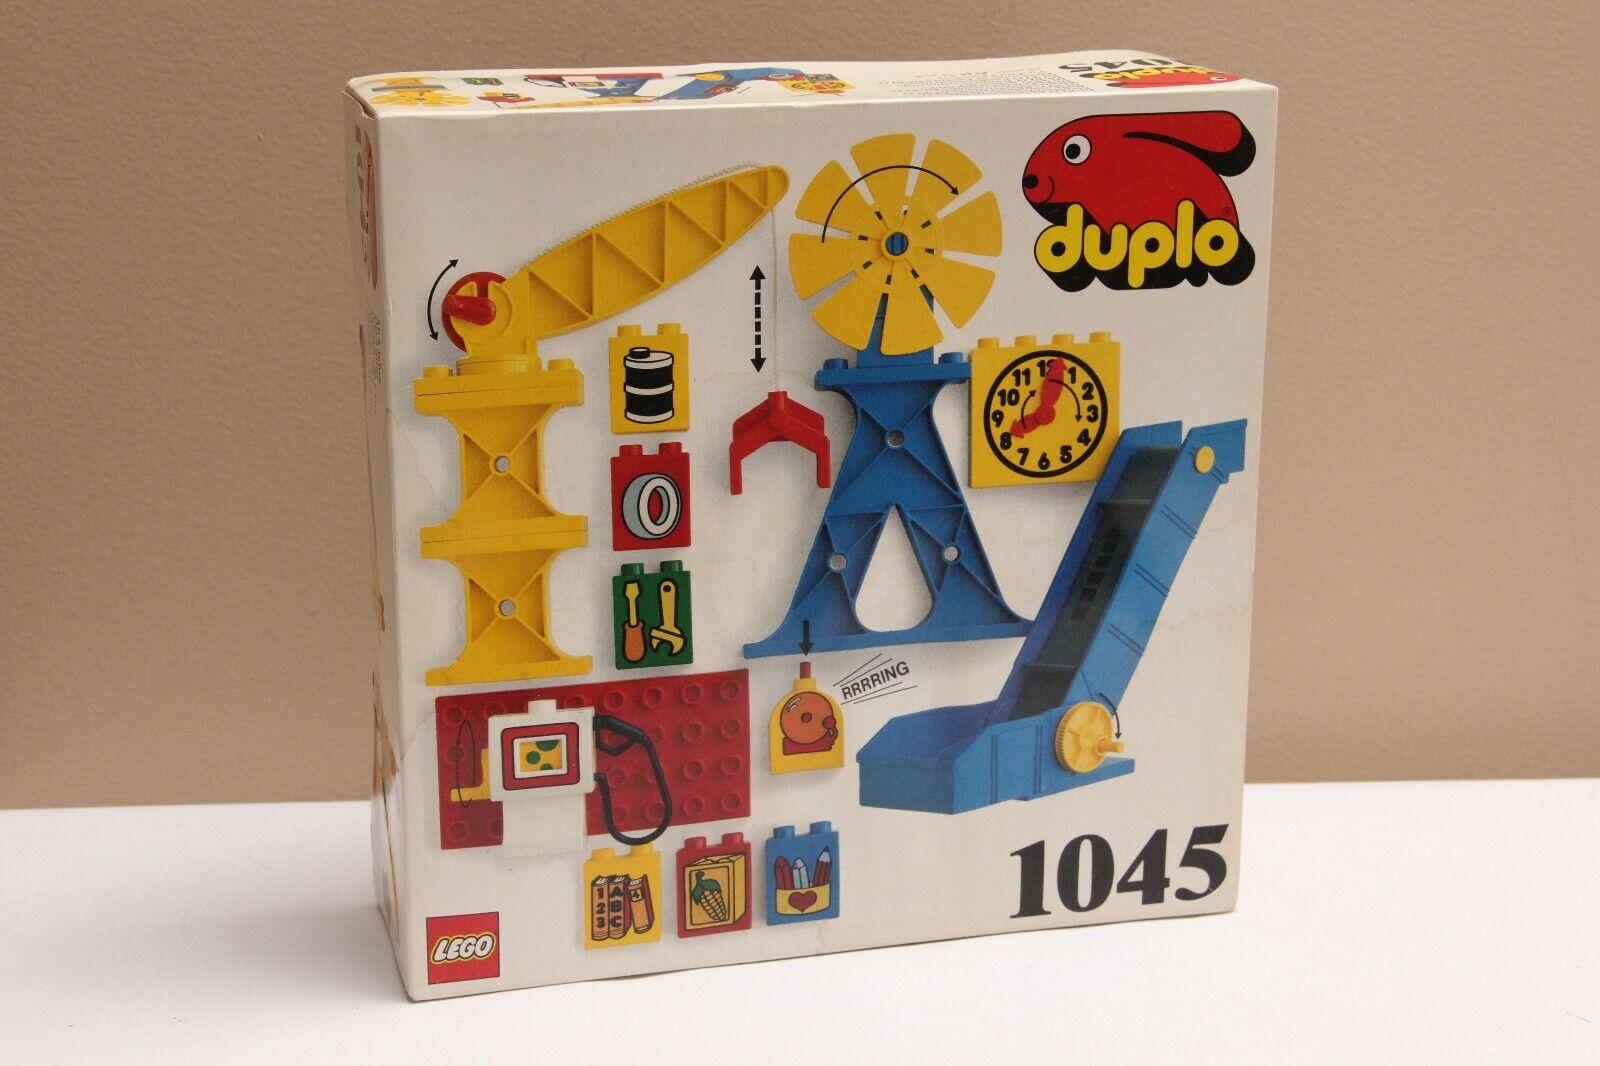 LEGO DUPLO 1045 Industrial Elements Set New and Sealed Some Damage Vtg. NIB